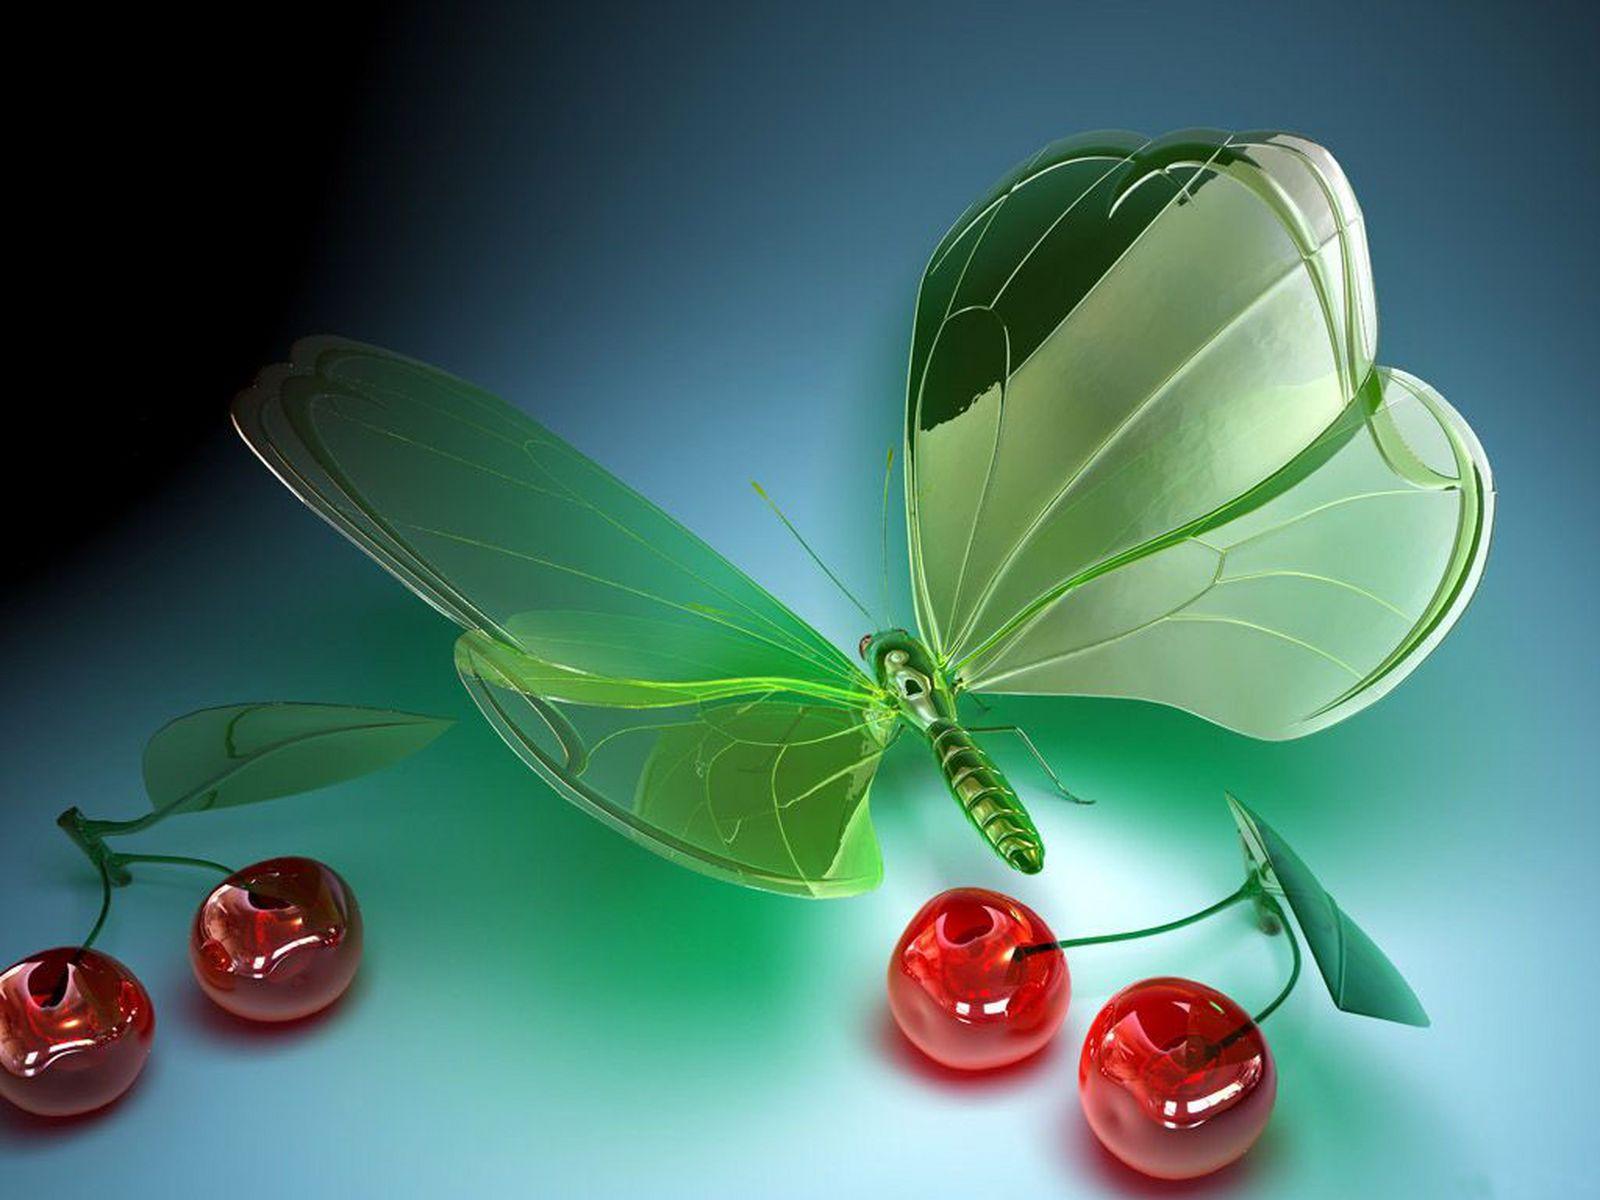 Download Butterfly 3D Art HD Wallpaper 4437 Full Size 1600x1200